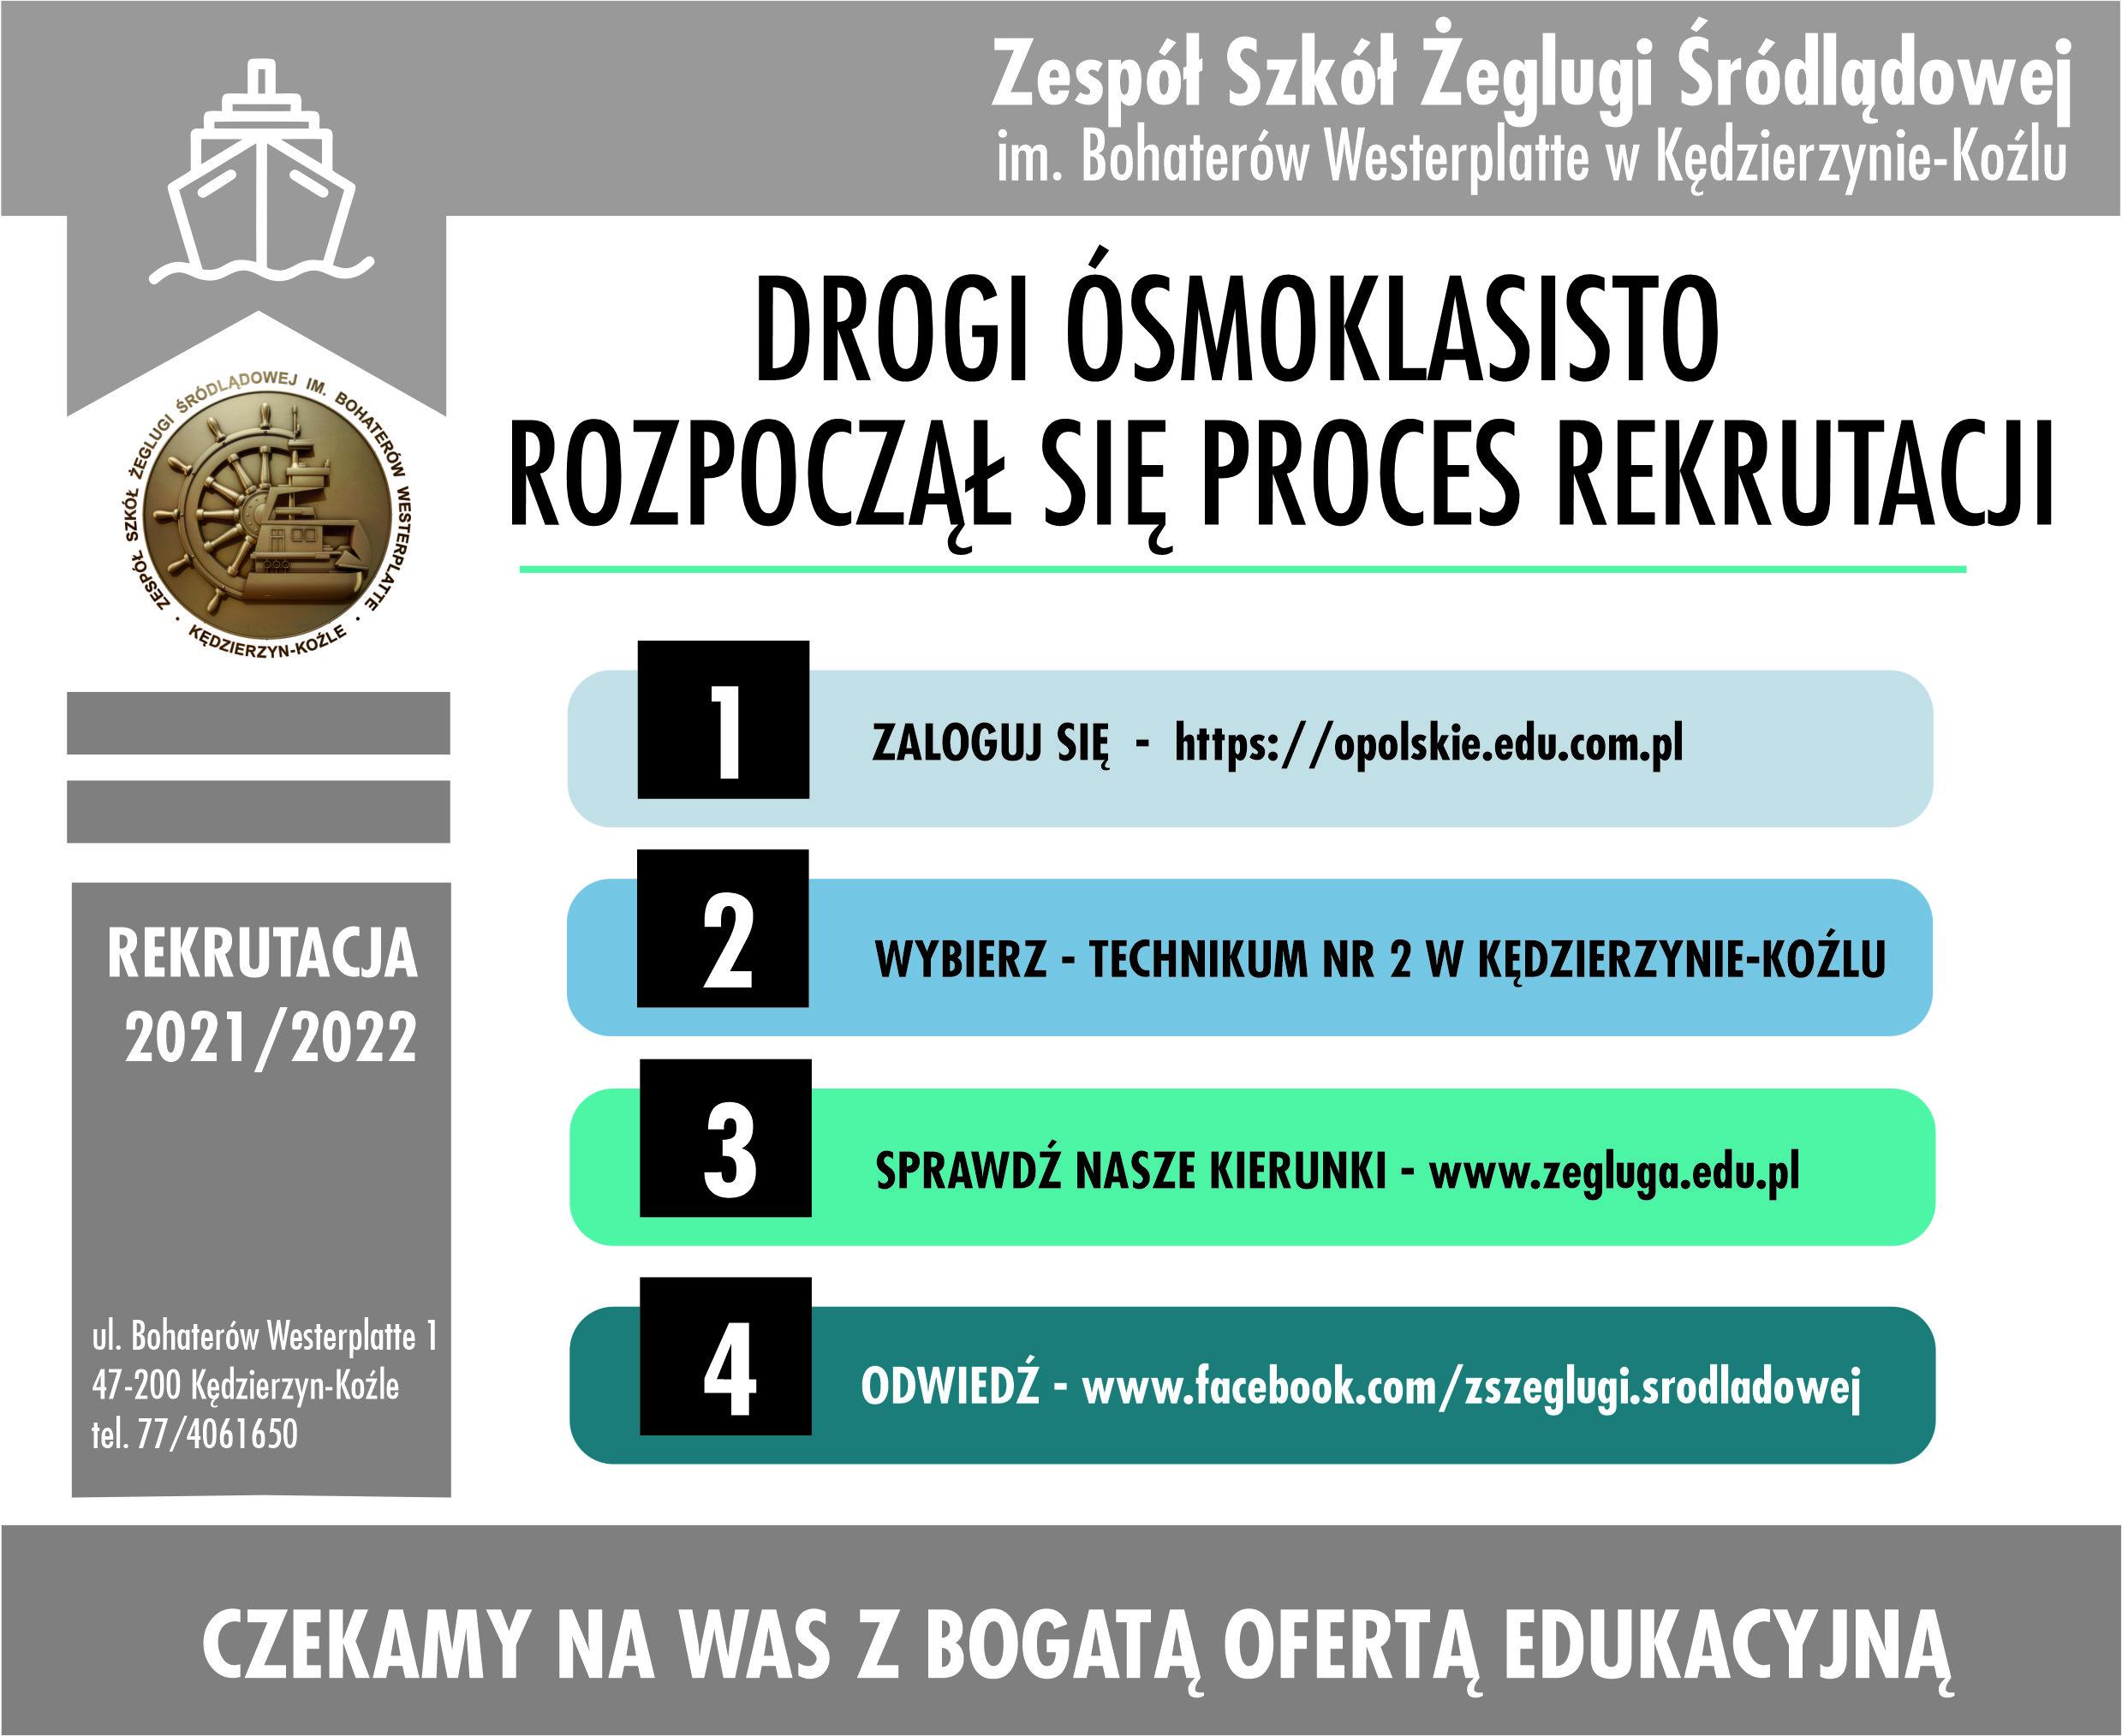 RUSZA REKRUTACJA 2021/2022